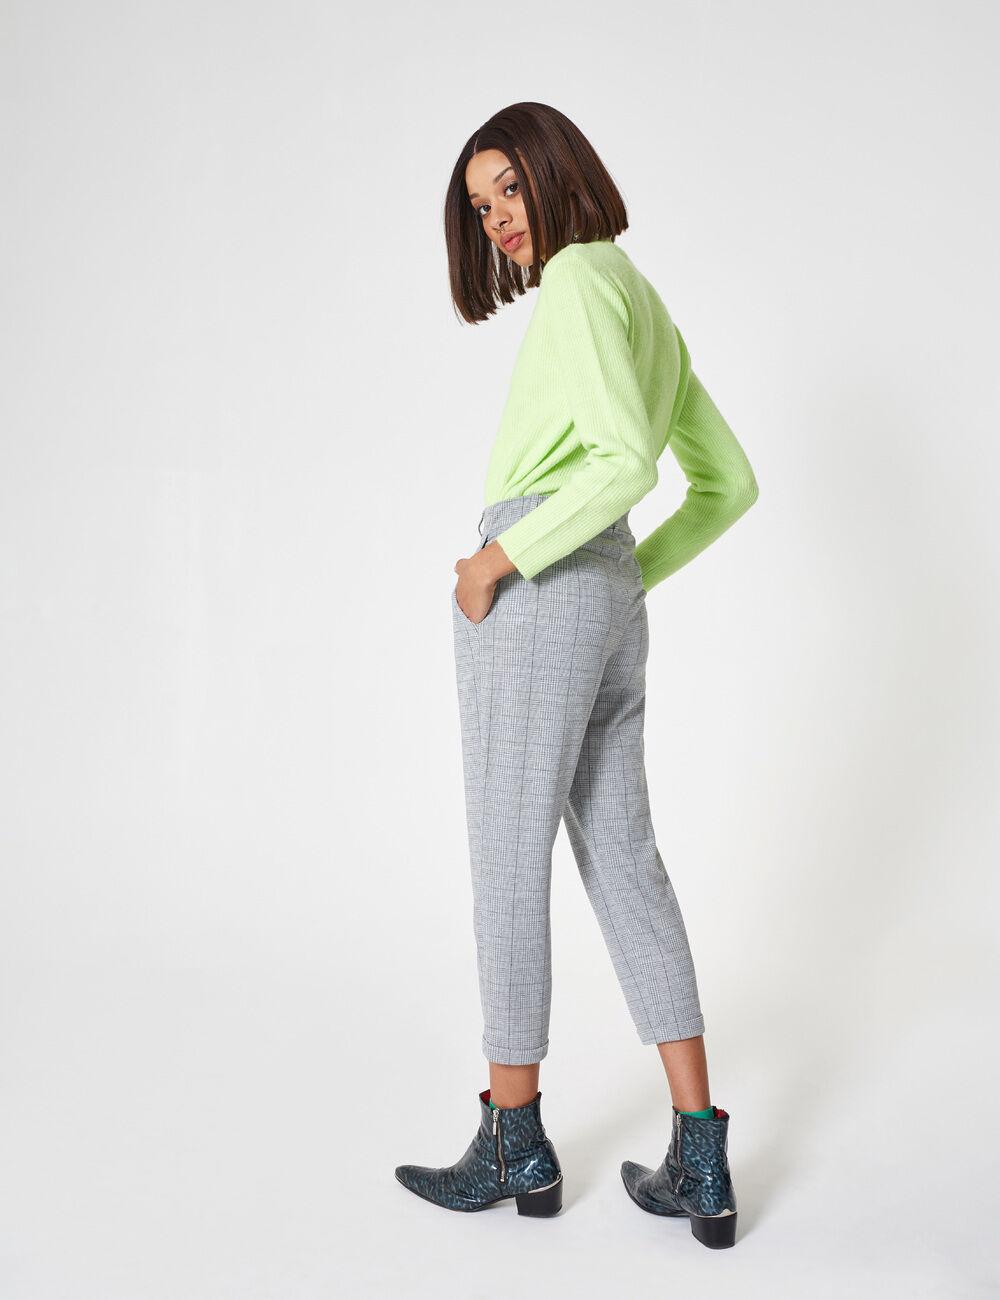 pantalon prince de galles gris et blanc femme jennyfer. Black Bedroom Furniture Sets. Home Design Ideas